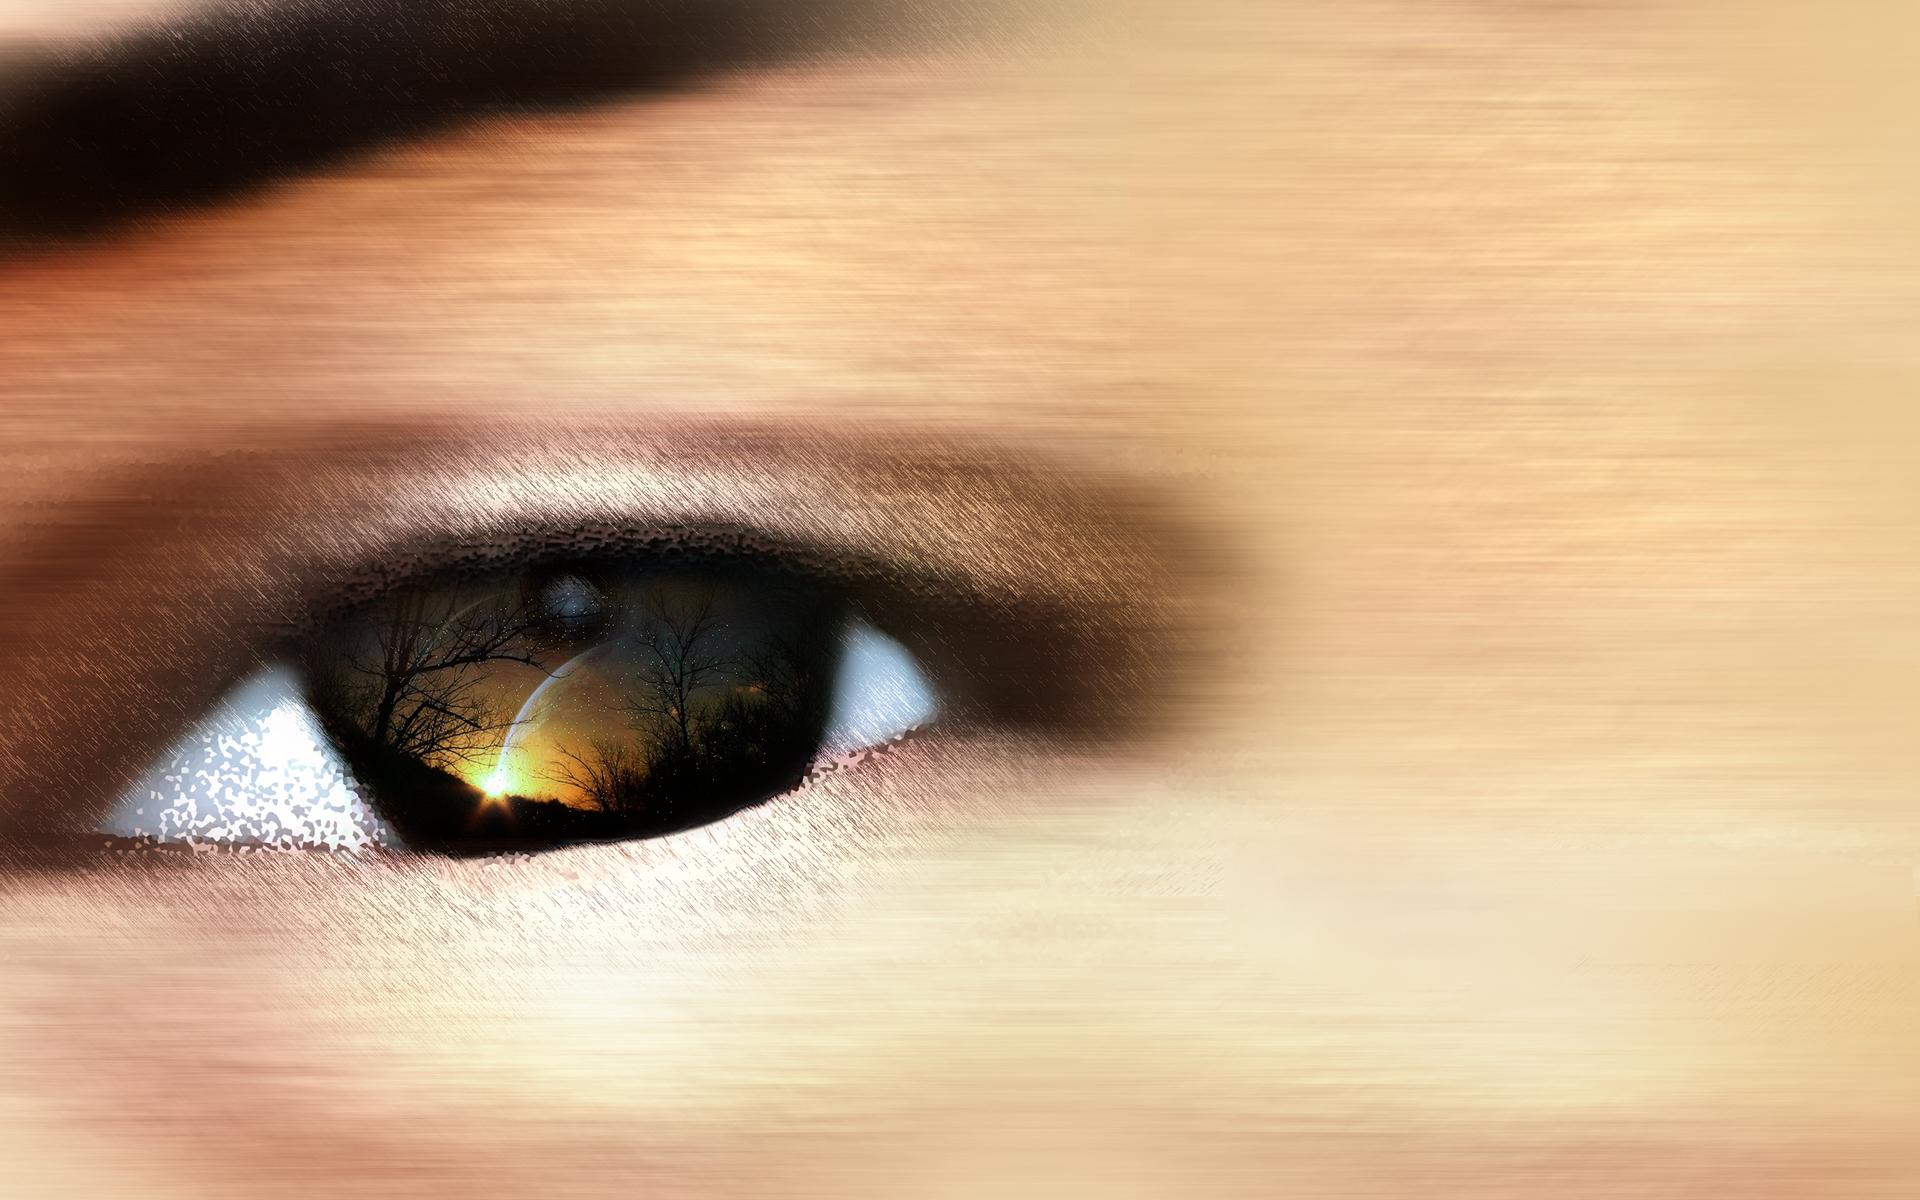 eye2 BACKGROND